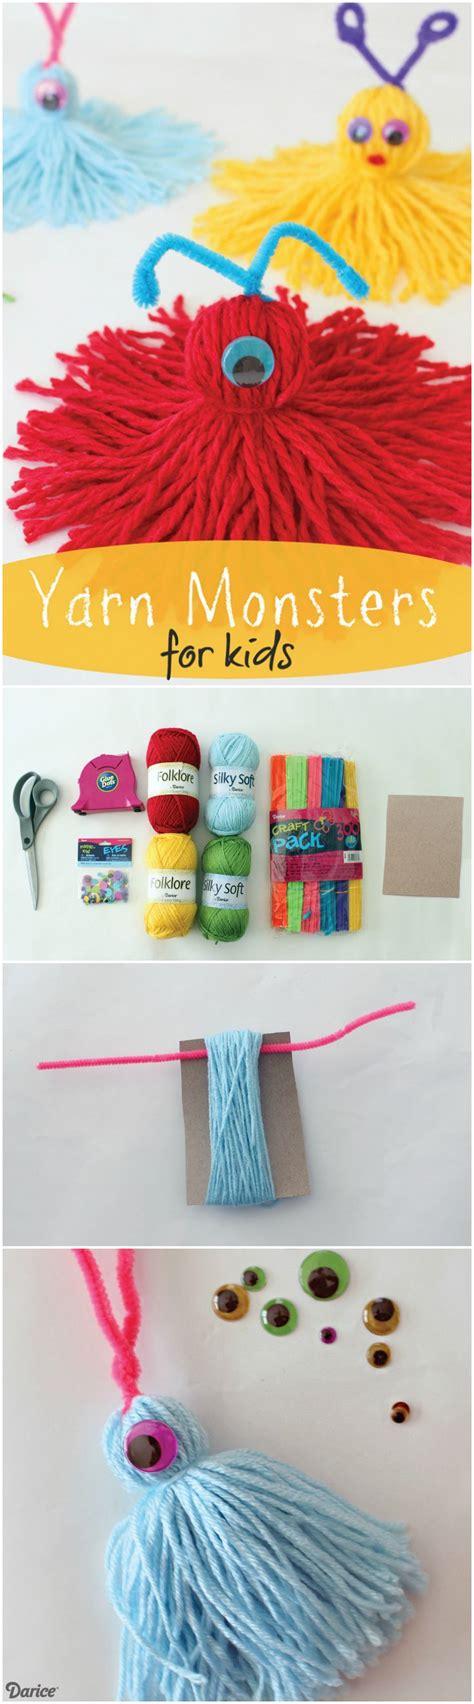 yarn activities for preschoolers best 25 yarn monsters ideas on crafts 733